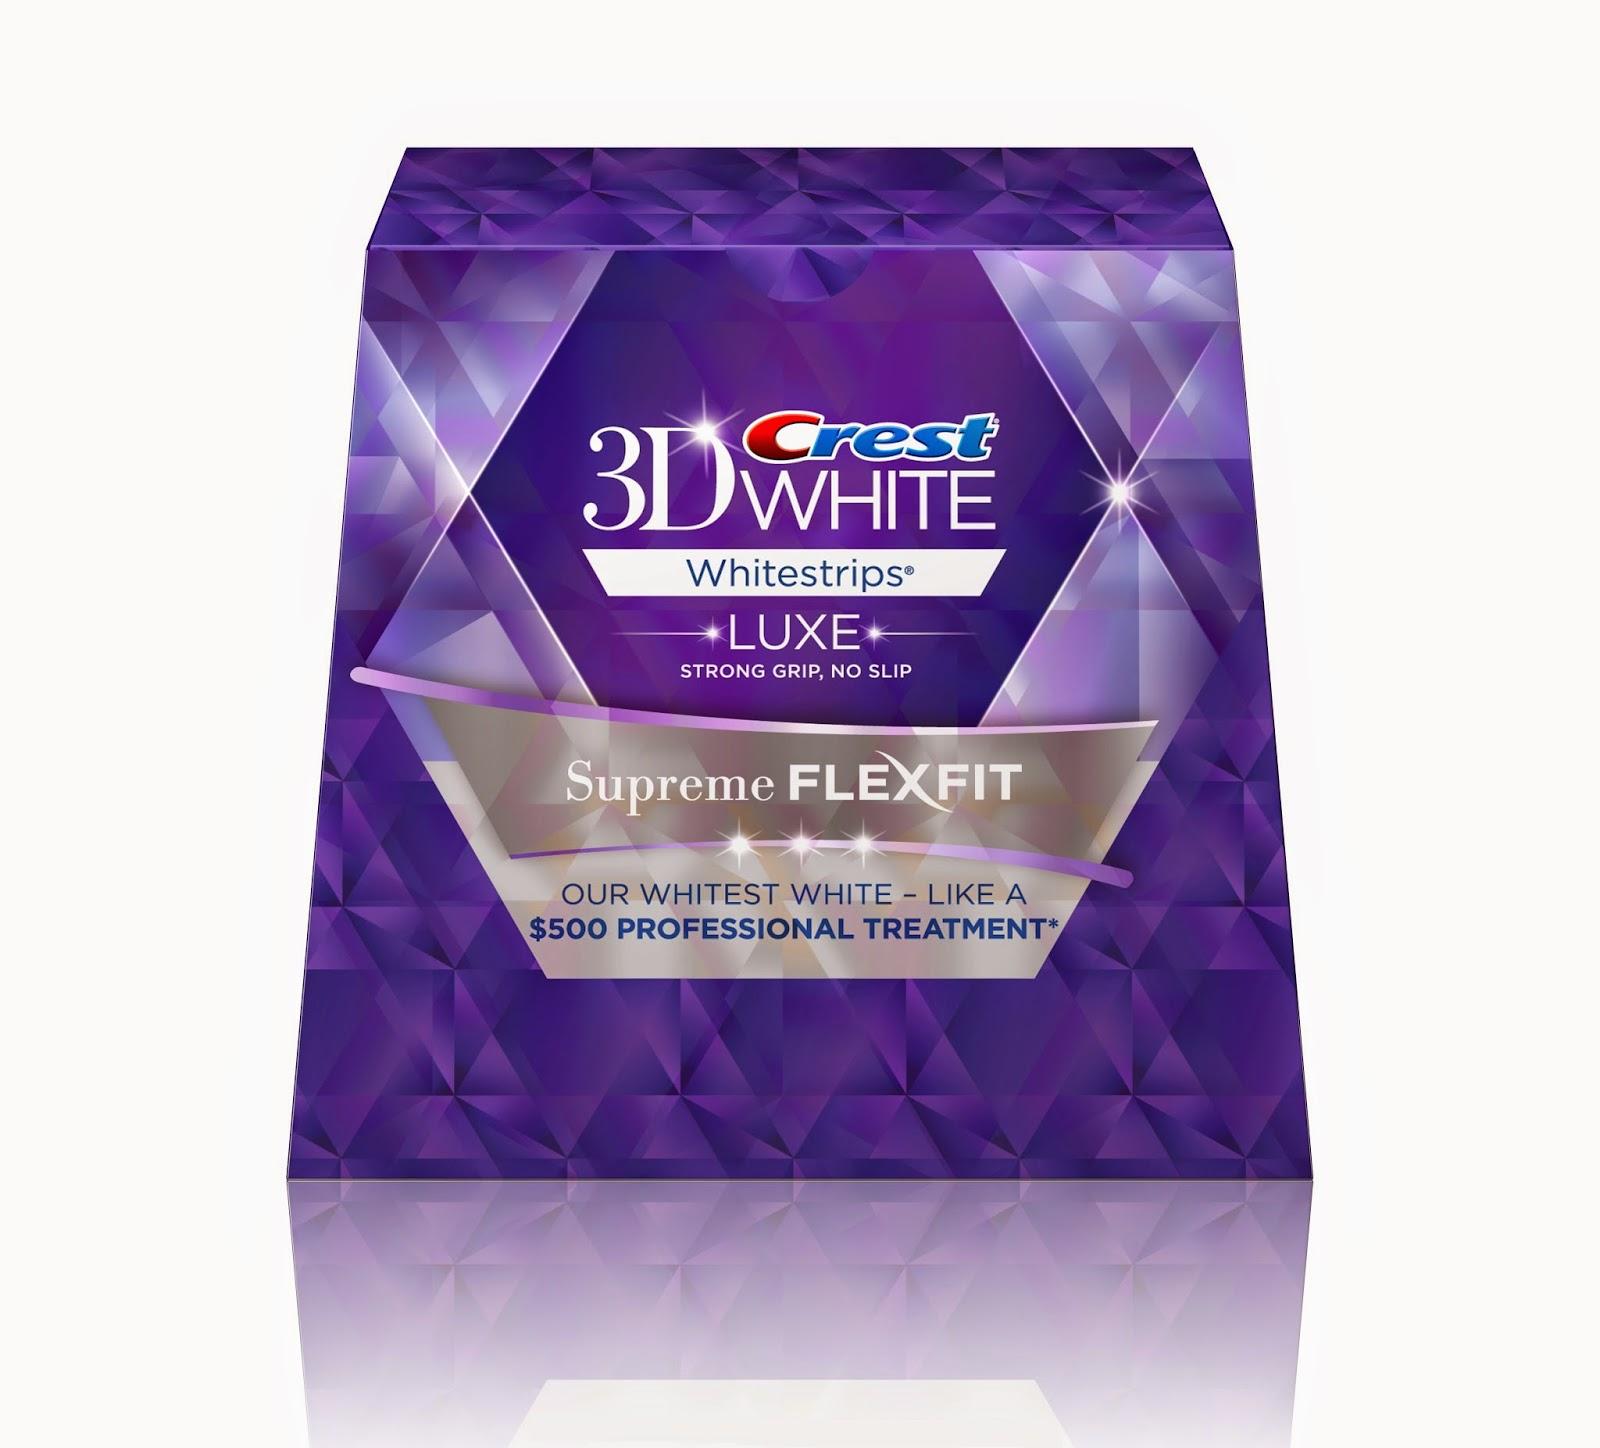 Crest 3d white whitestrips luxe supreme flexfit